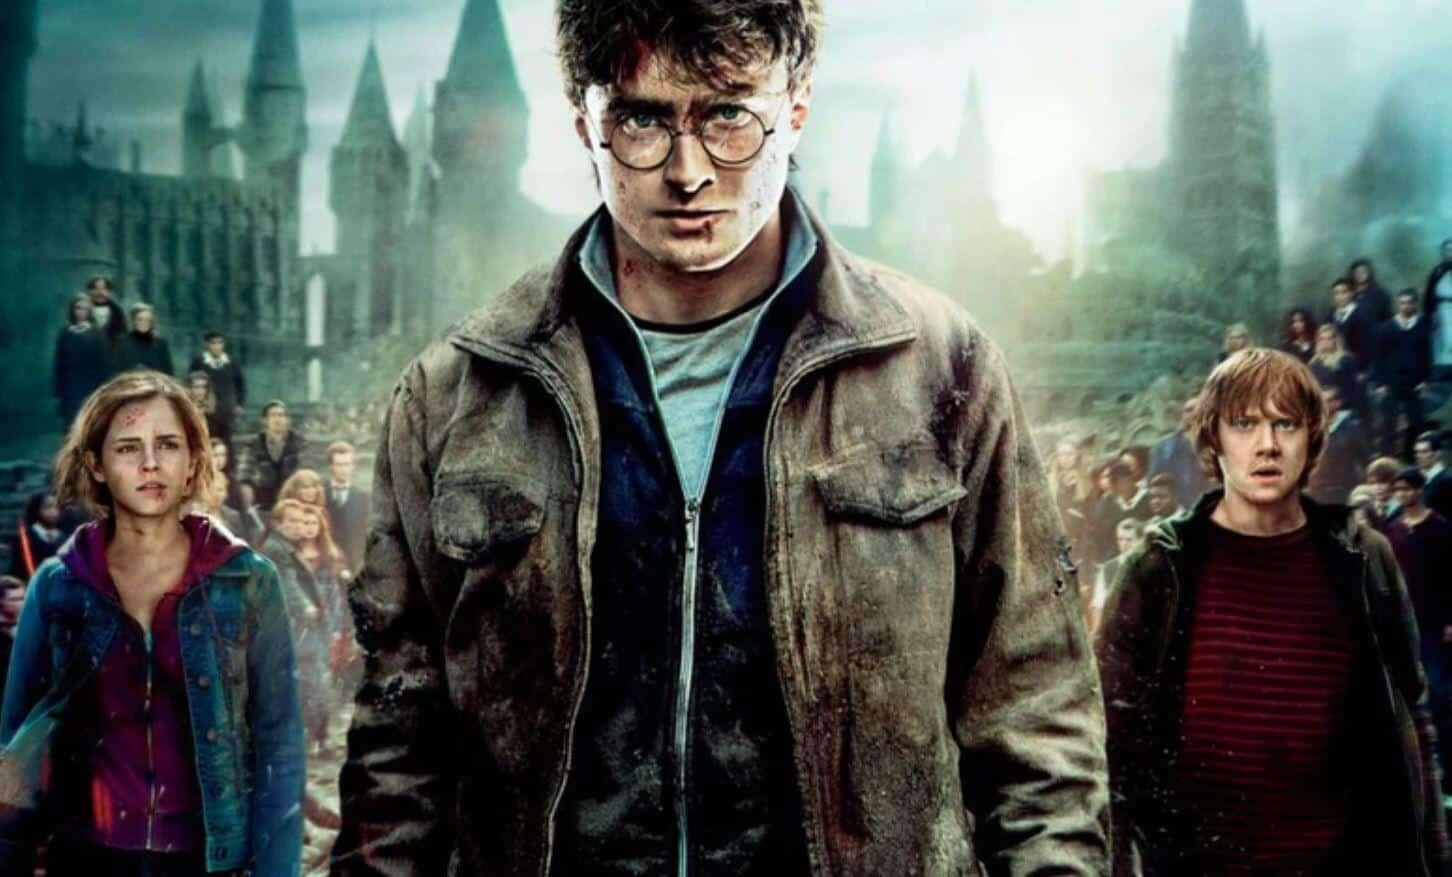 J.K. Rowling Harry Potter